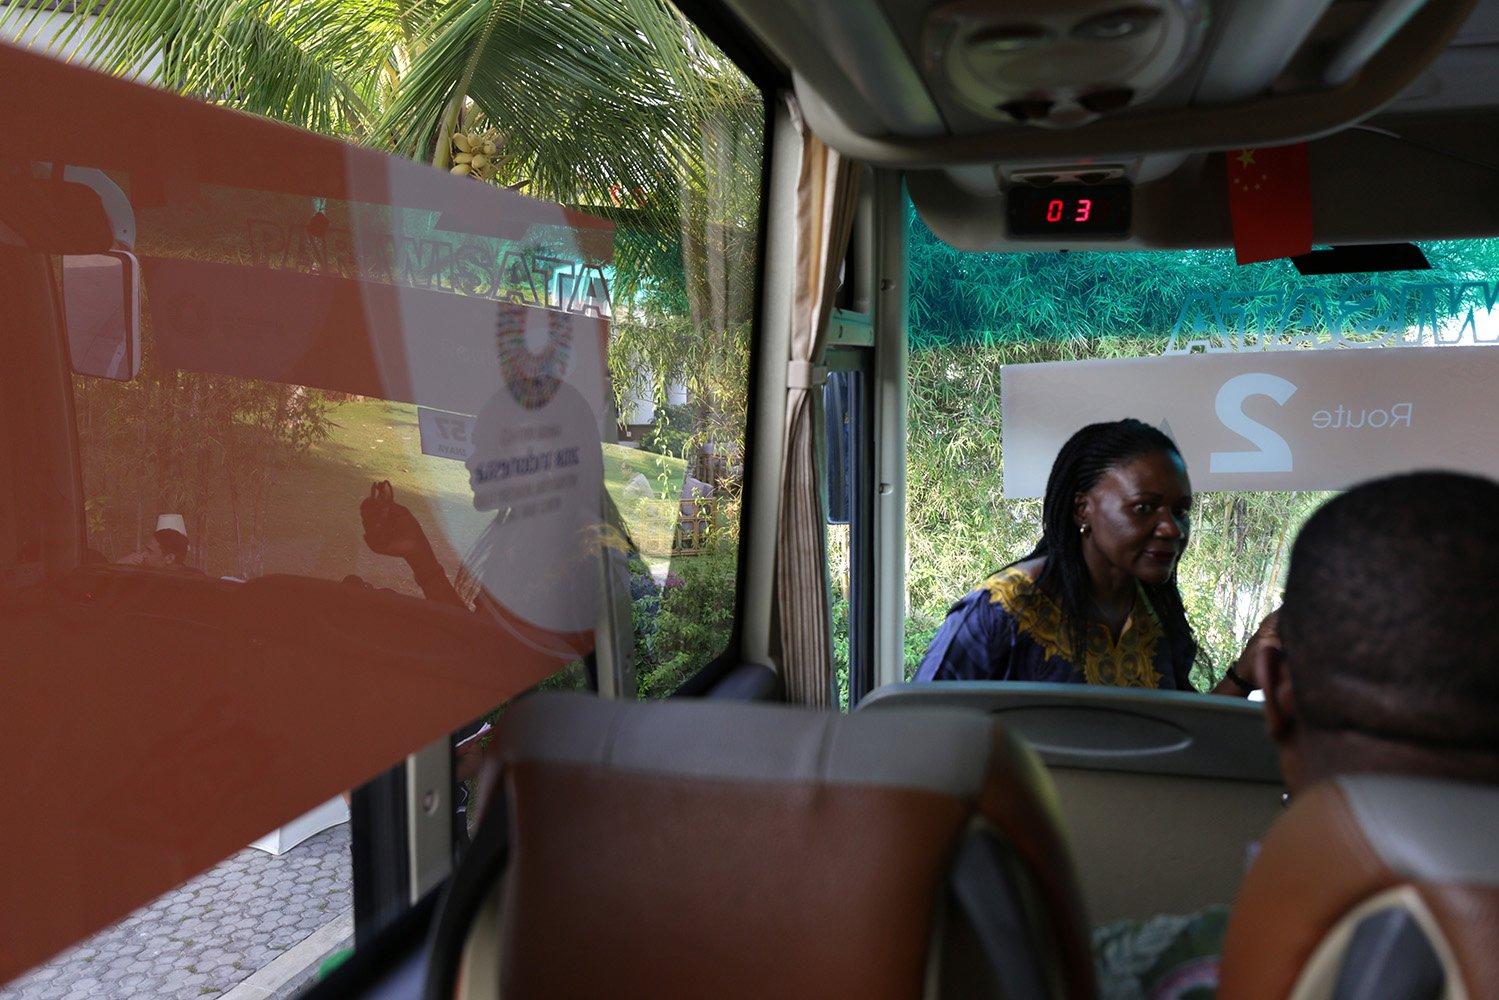 Partisipan delegasi AM IMF-WB 2018 memasuki shuttle bus di kawasan Nusa Dua, Bali (14/10). Shuttle bus efektif beroperasi seluruhnya sebagai salah satu moda transportasi selama dikawasan Annual Meeting pada Senin 8 Oktober 2018 dengan berbagai rute.